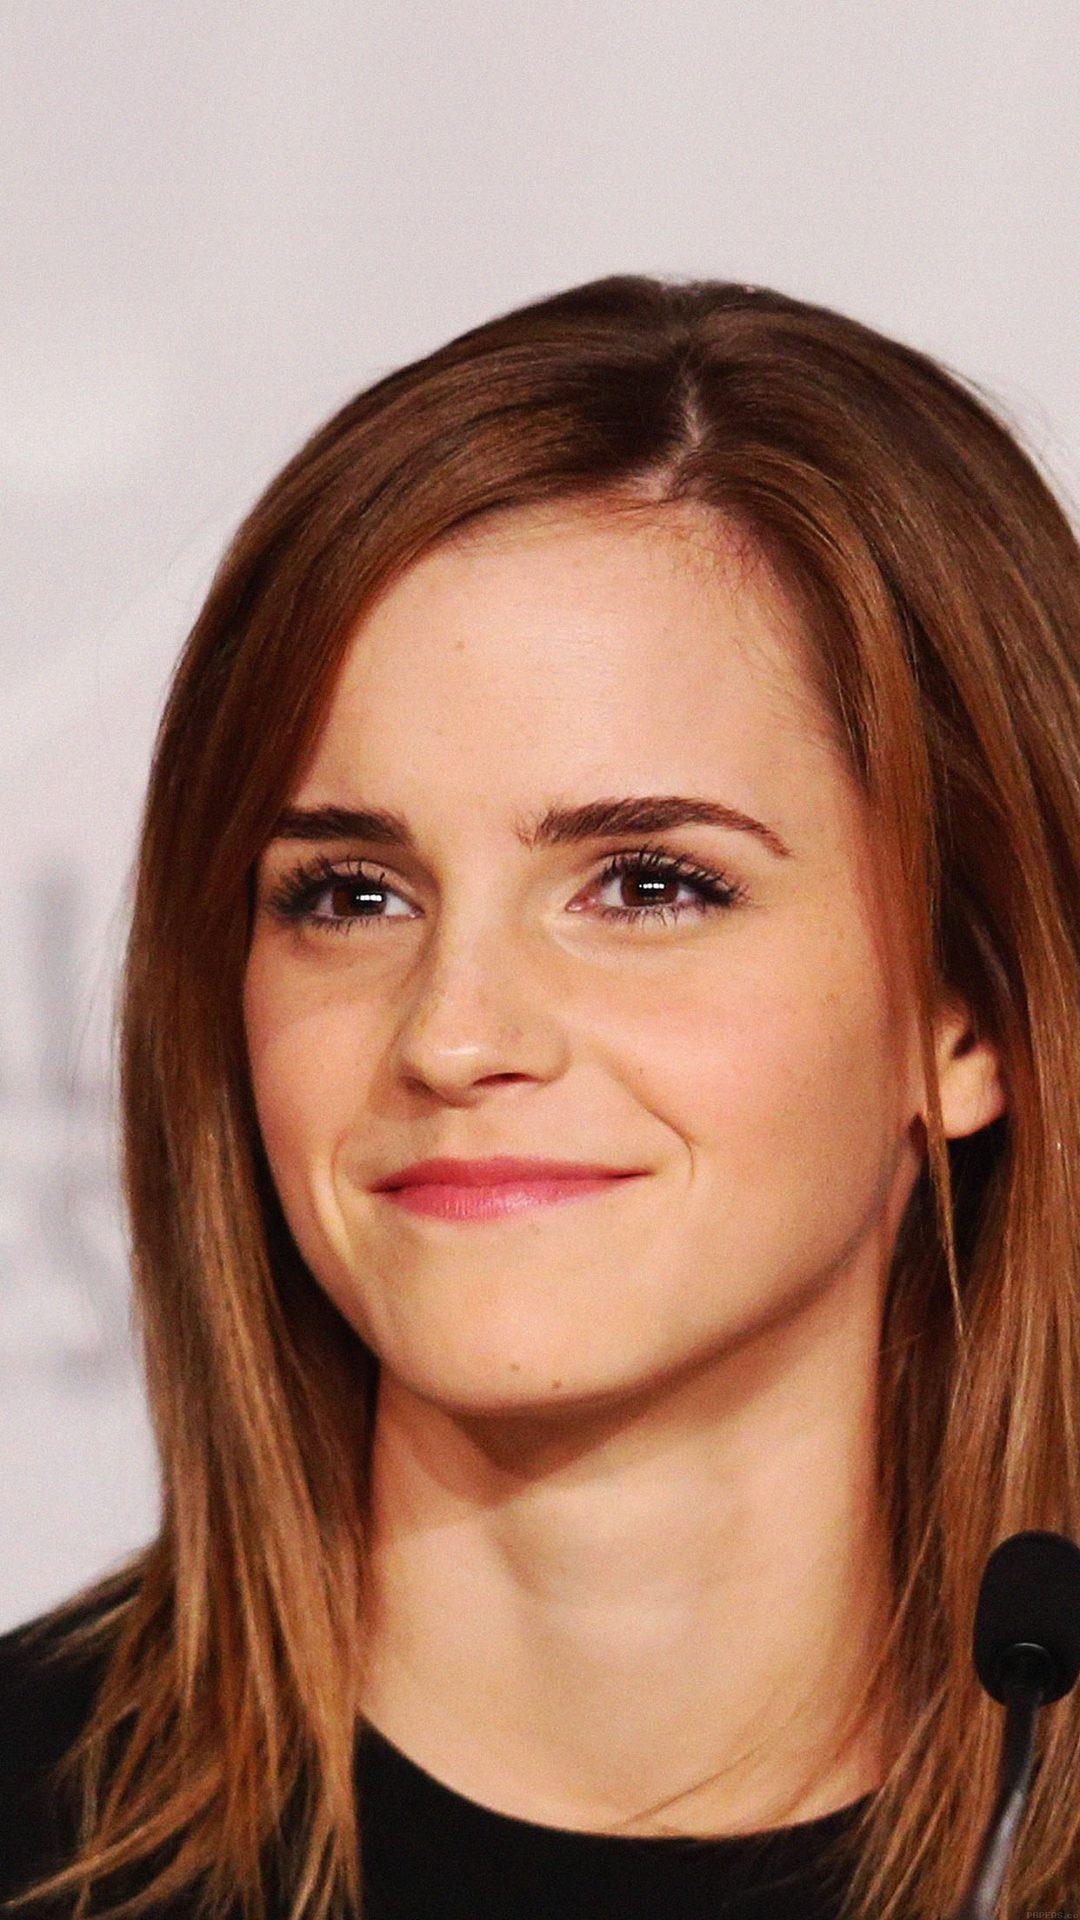 Wallpaper Emma Watson Smile Cannes Film Girl